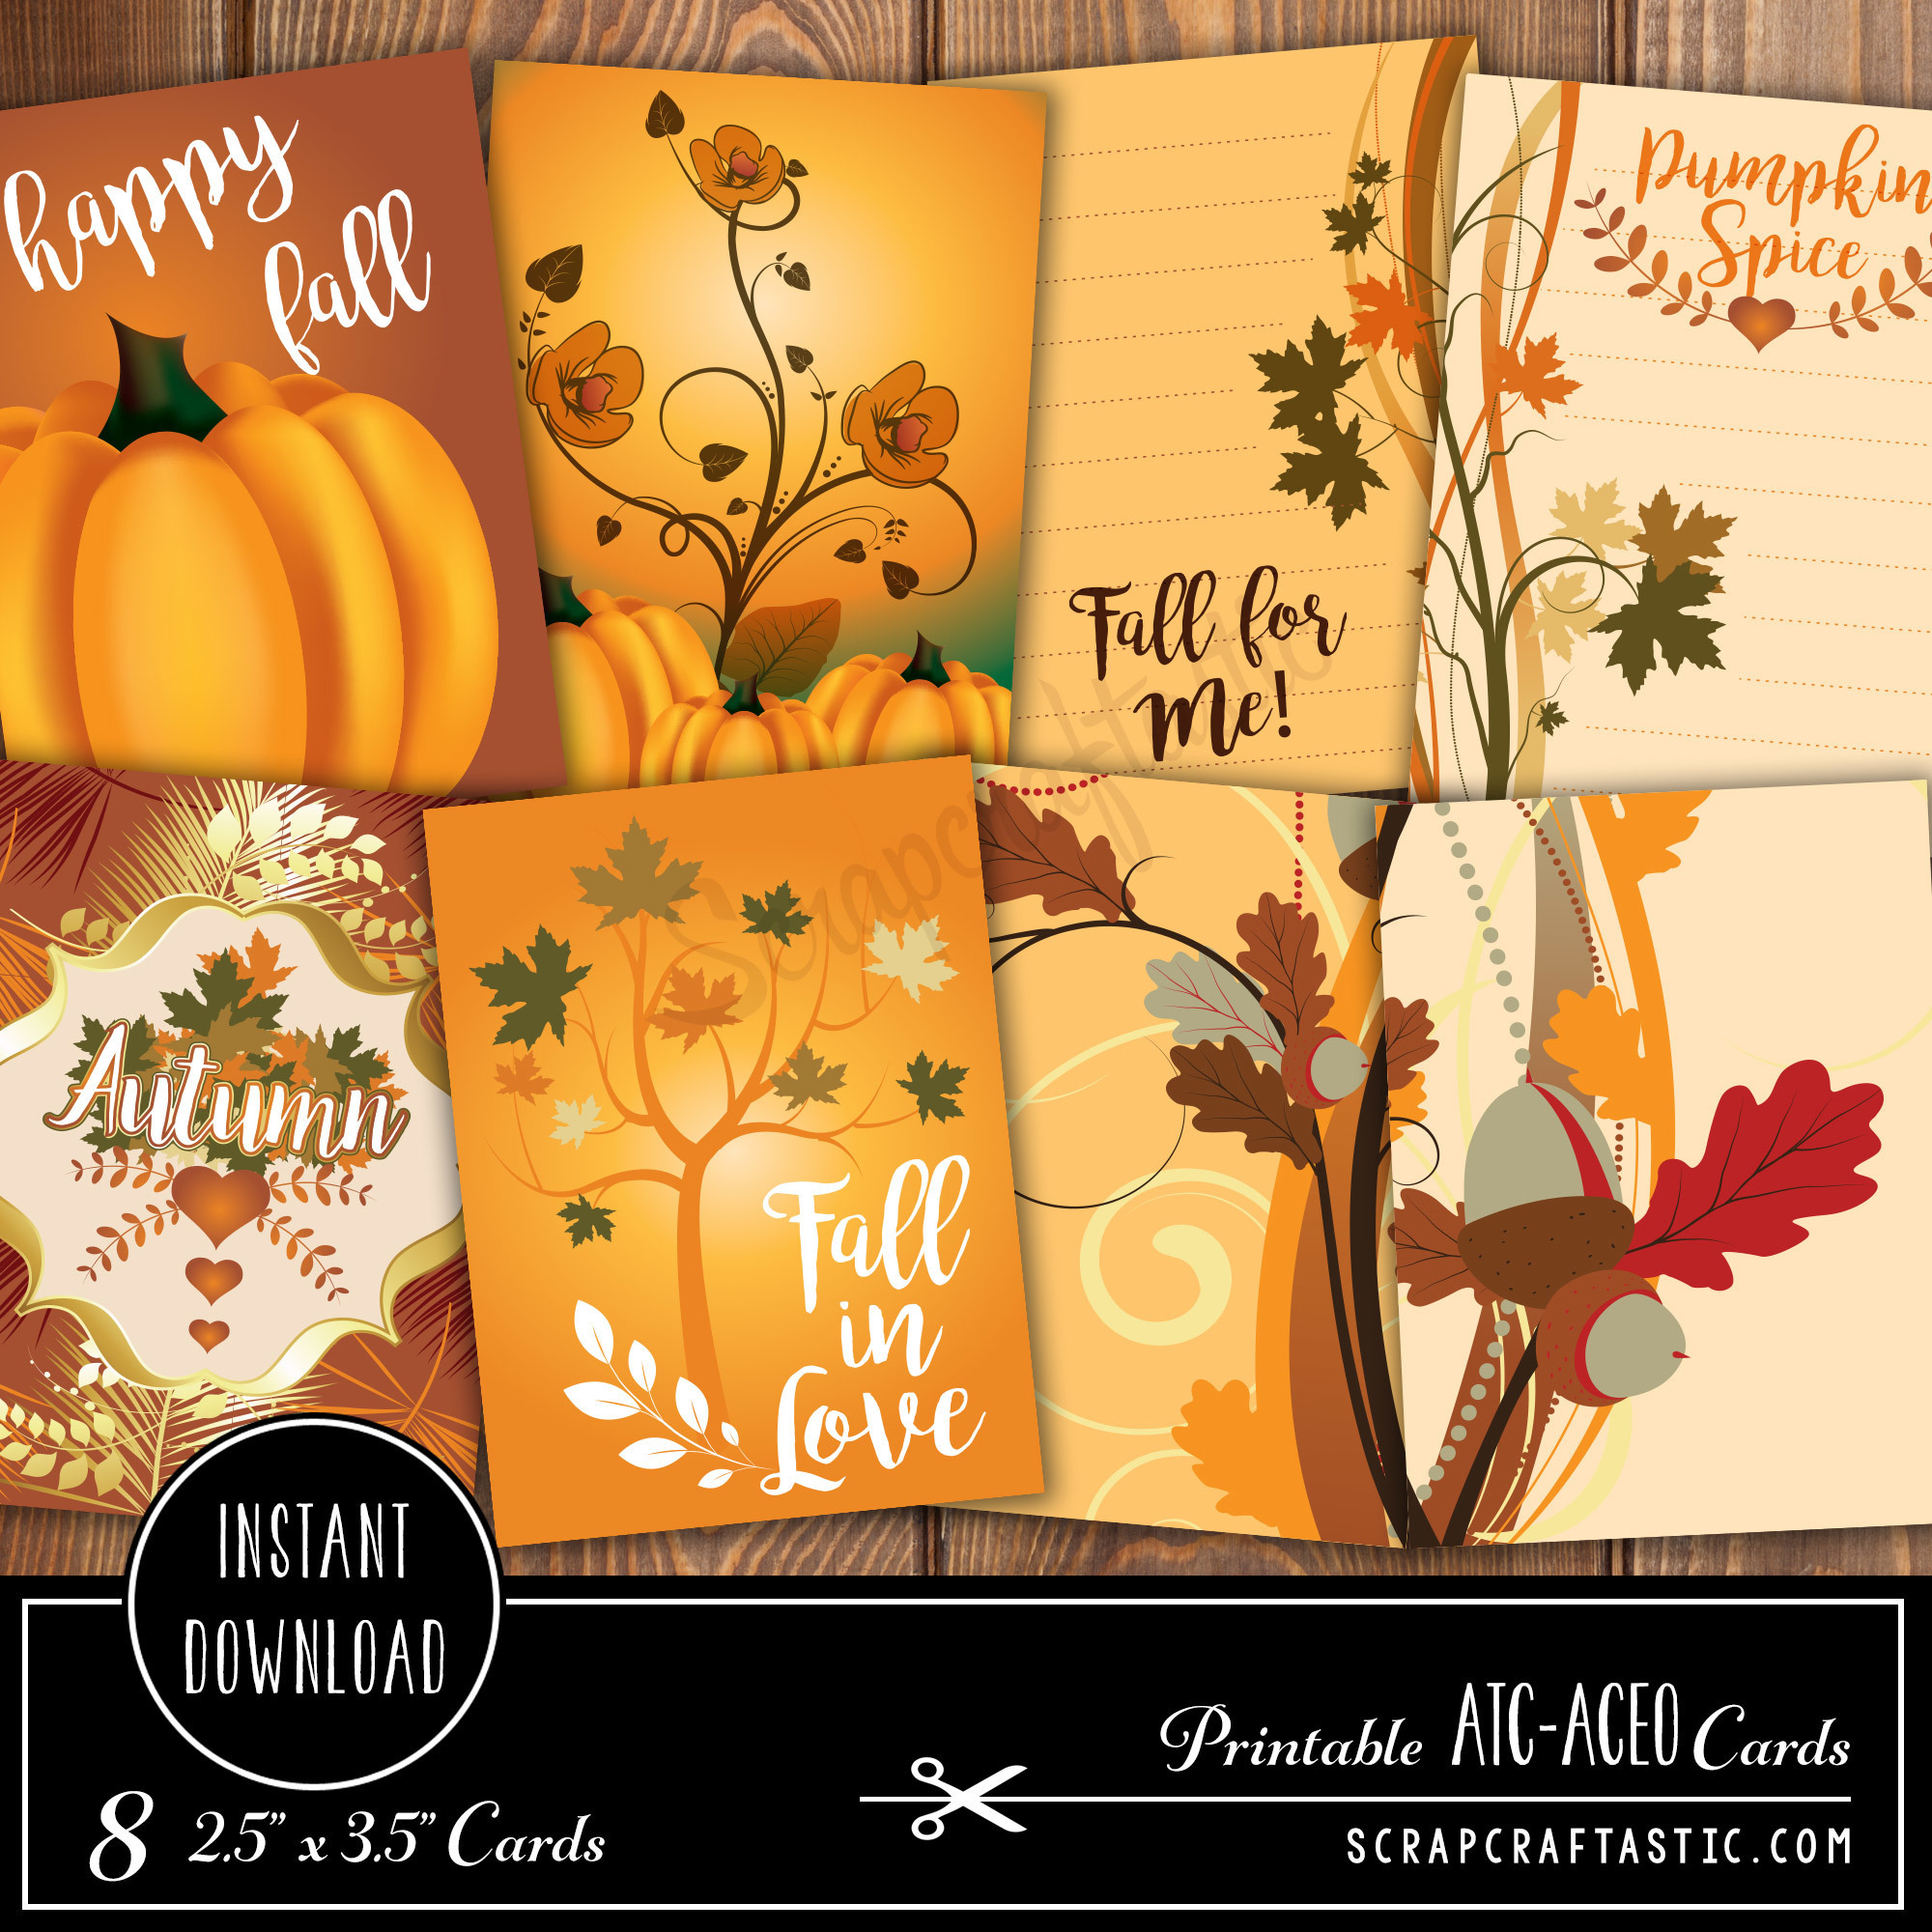 Pumpkin Spice ATC-ACEO Card Digital Collage Print Sheet 05000